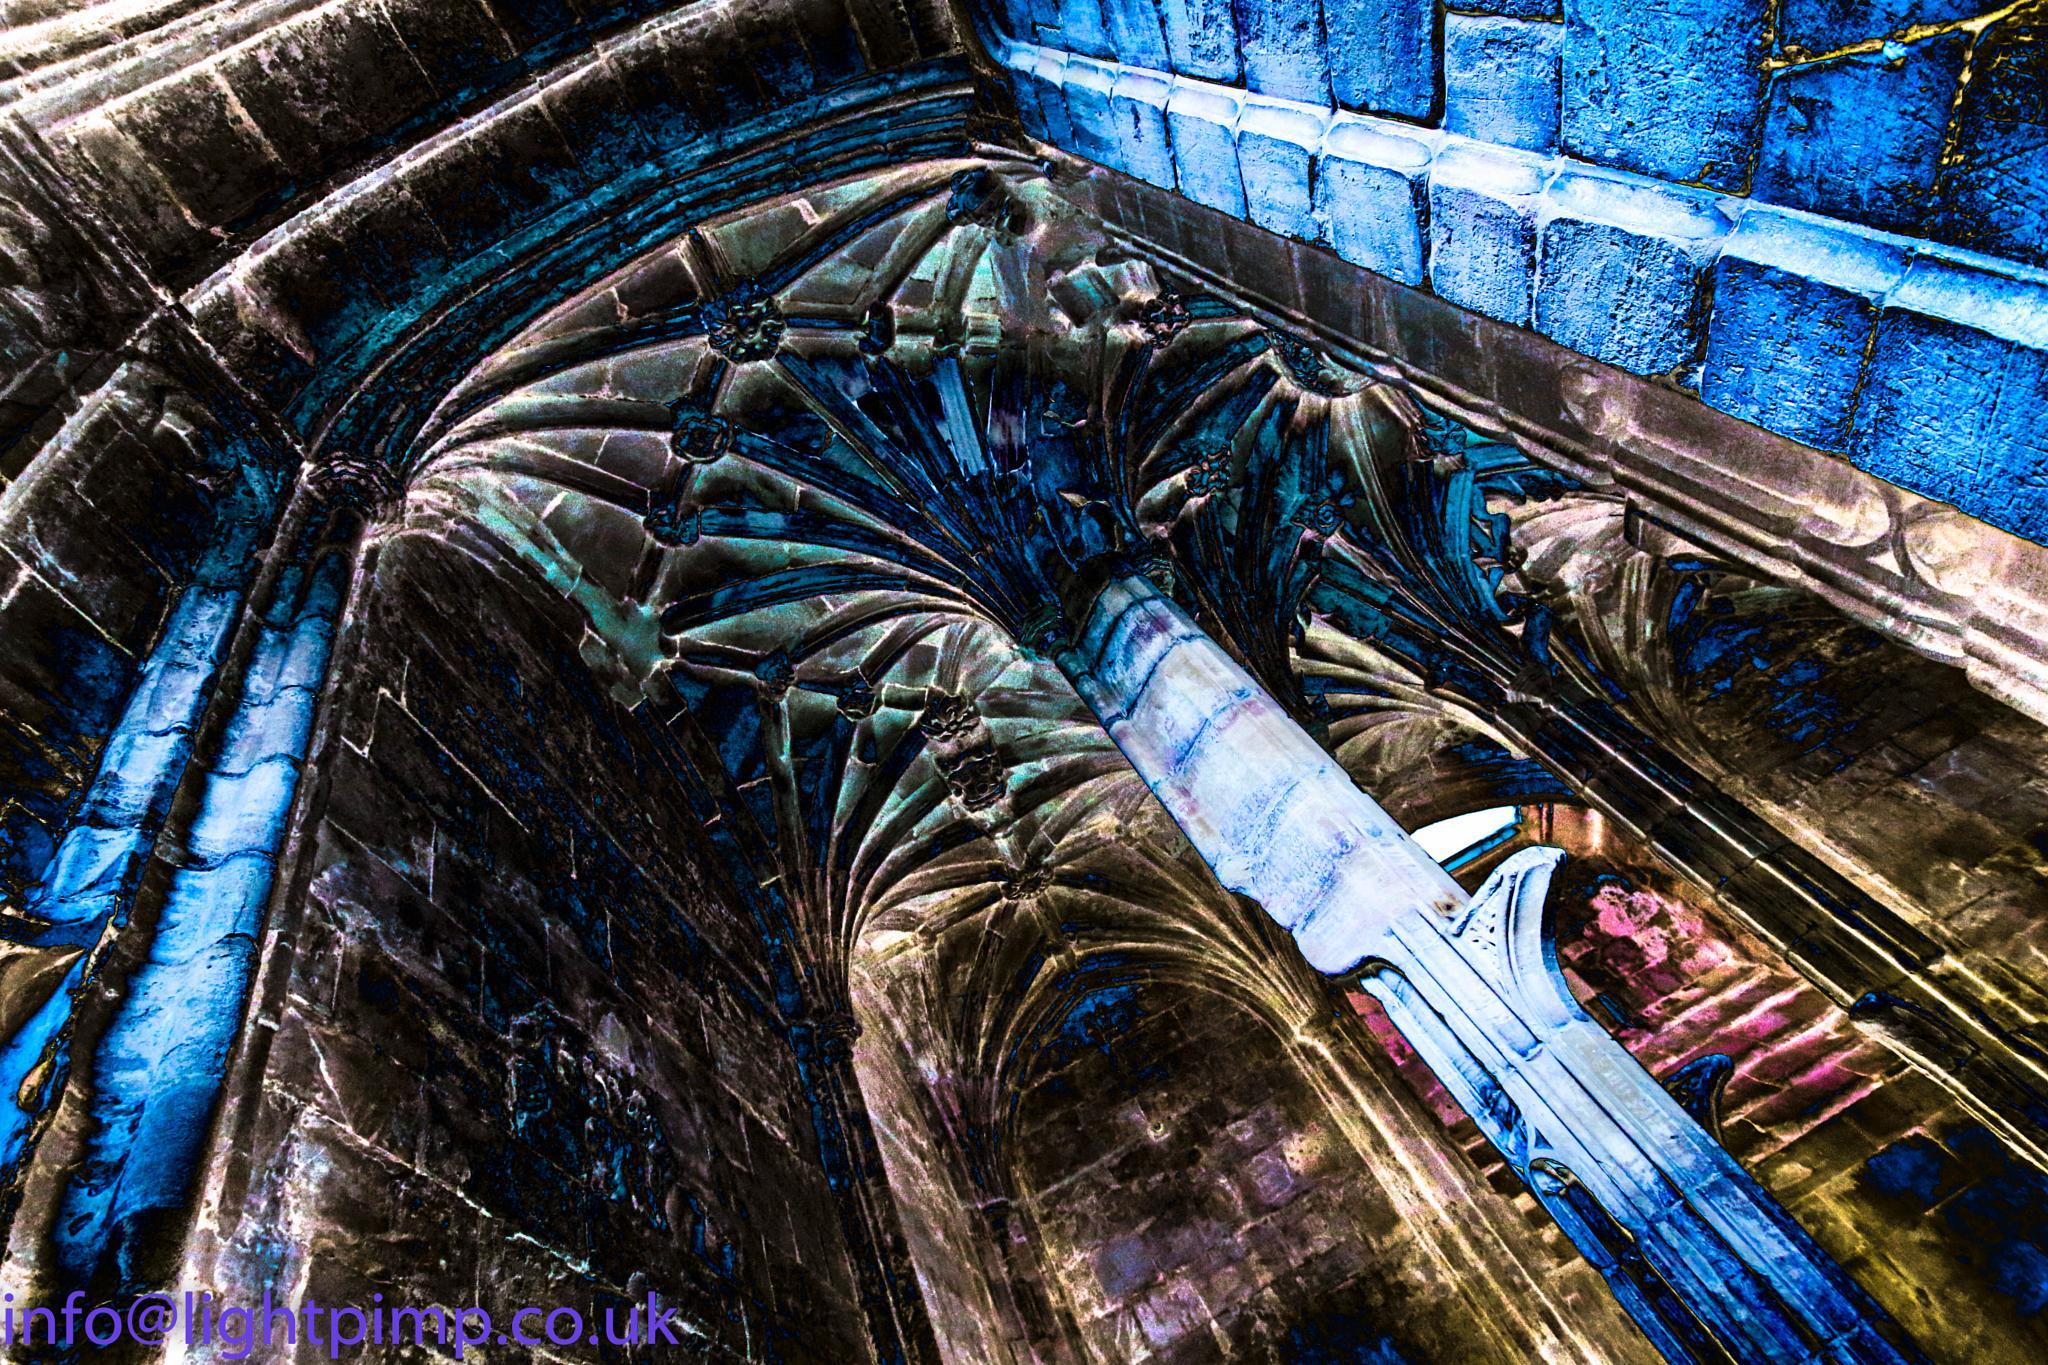 St Winifreds Well by Lightpimp - akadodjer